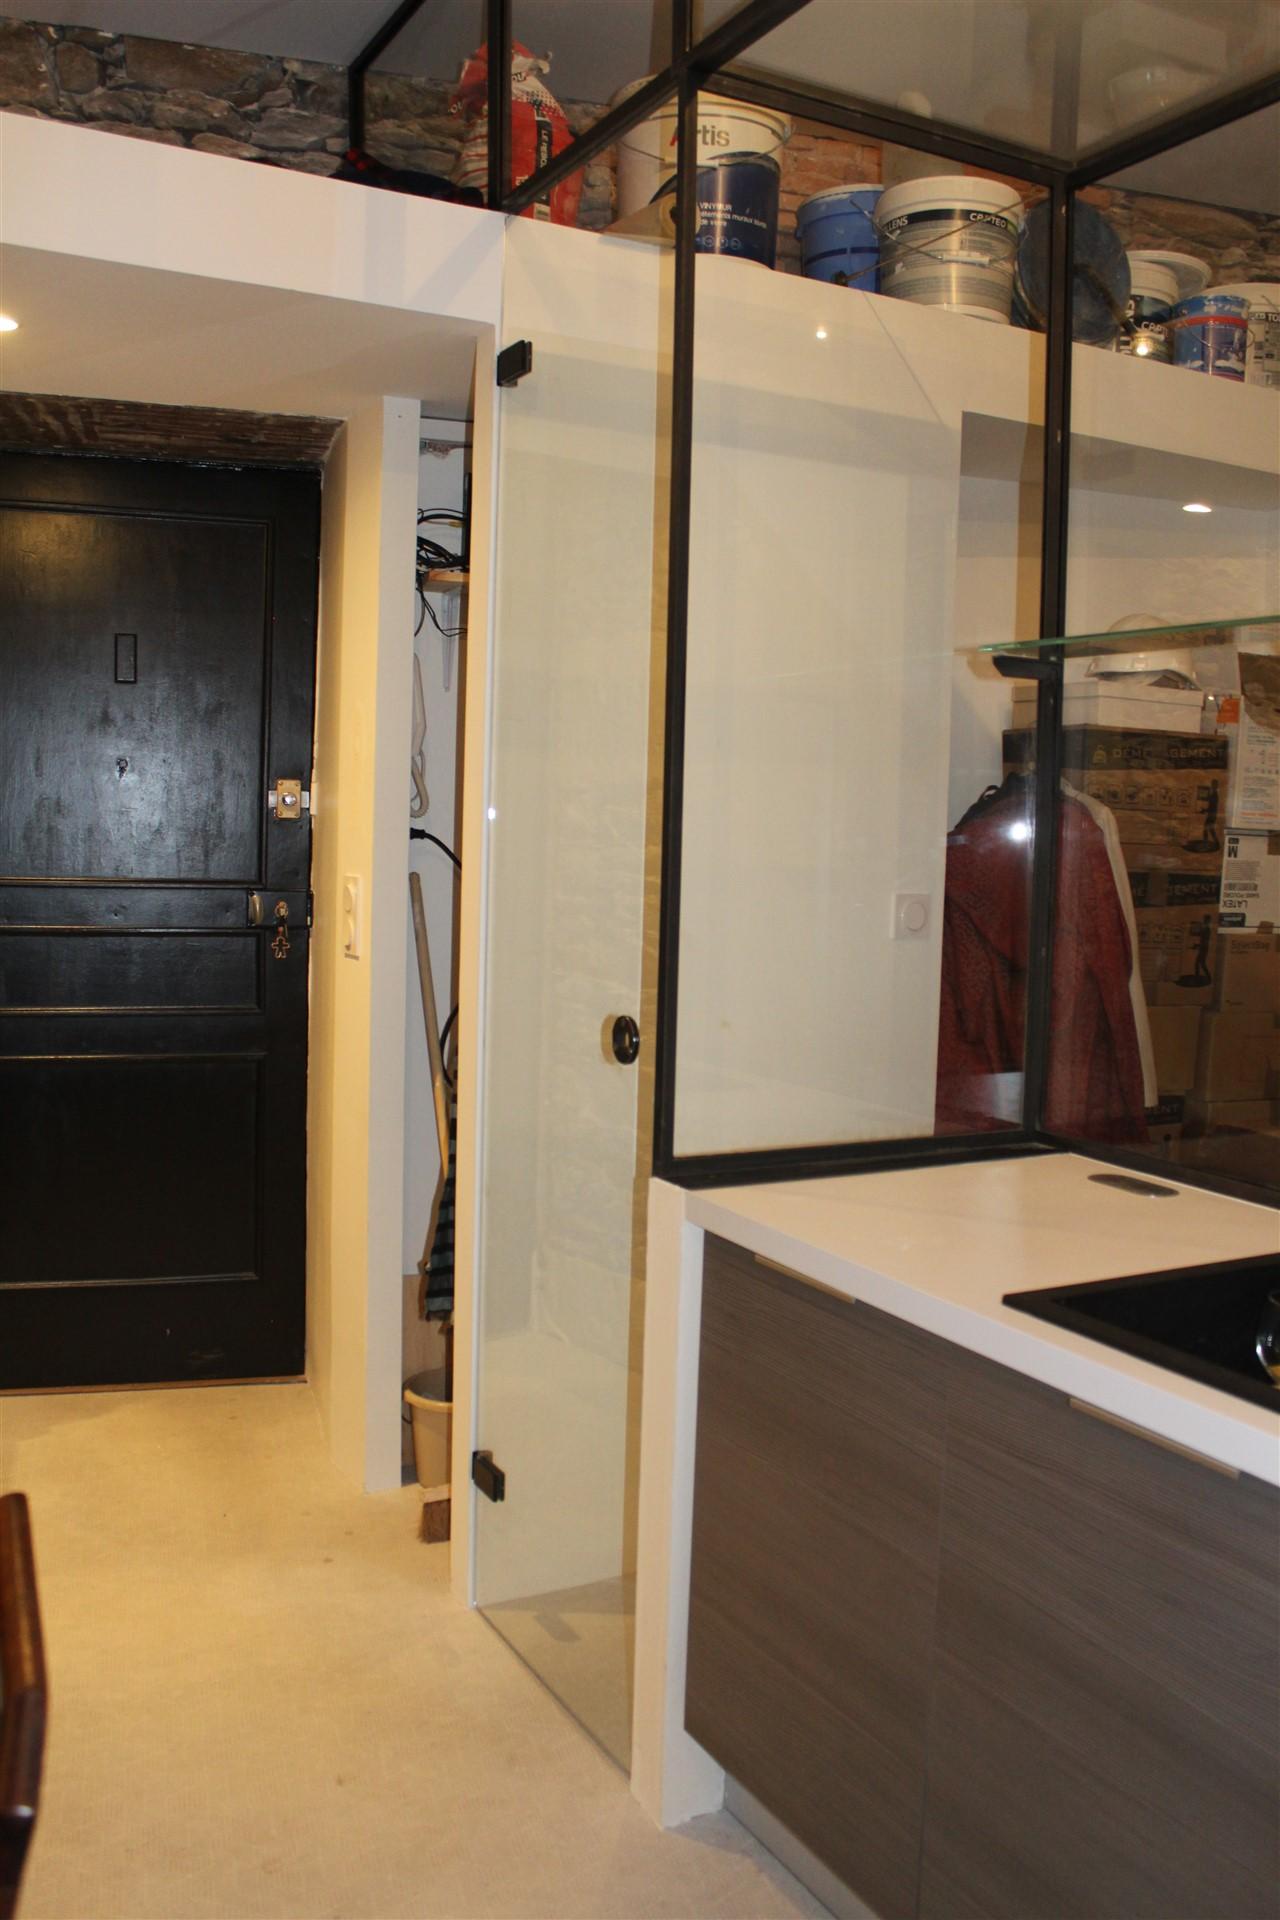 verri re l 39 ancienne et porte vitr e steel contemporain. Black Bedroom Furniture Sets. Home Design Ideas